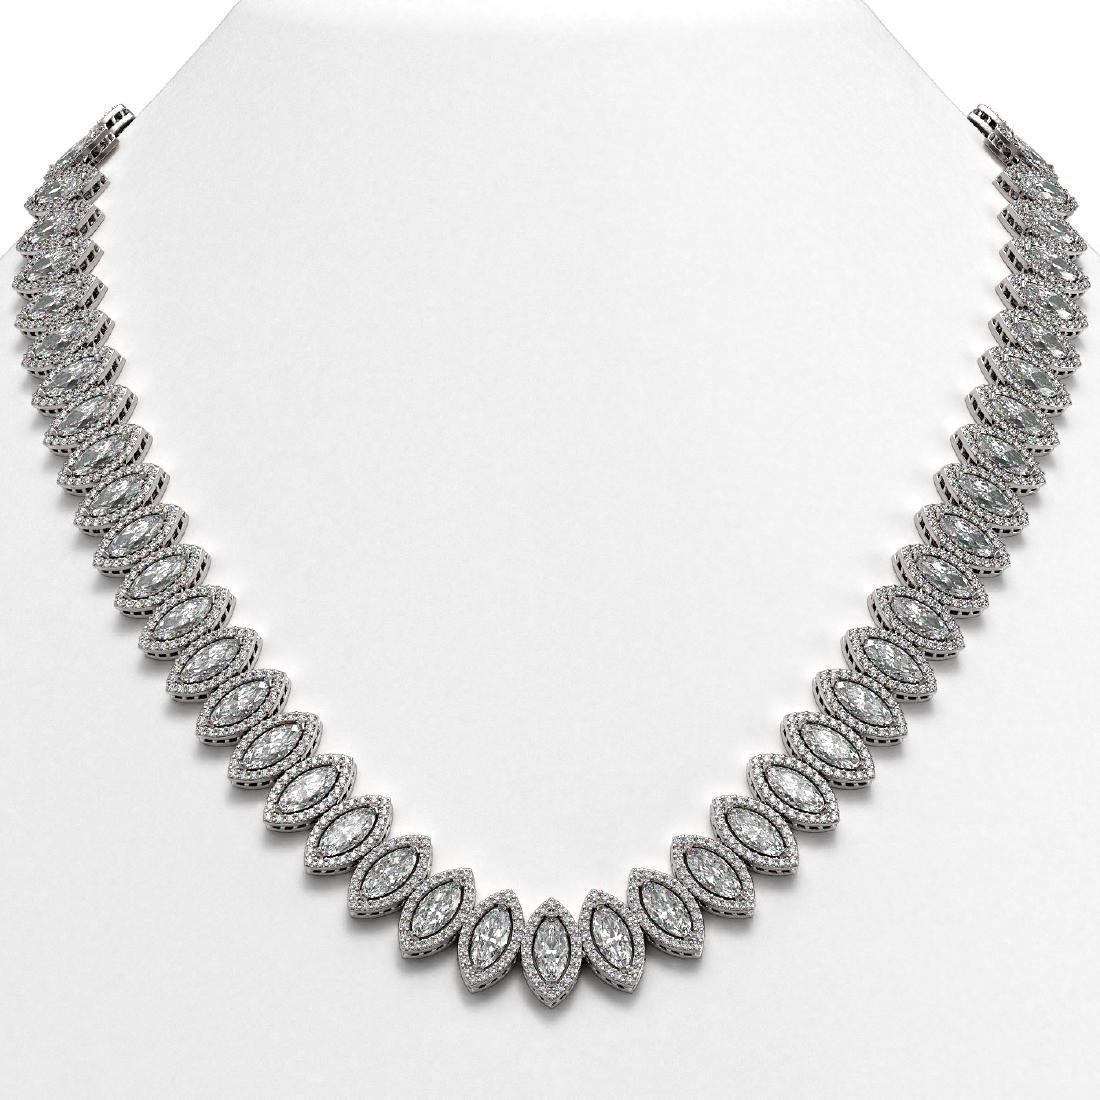 47.12 CTW Marquise Diamond Designer Necklace 18K White